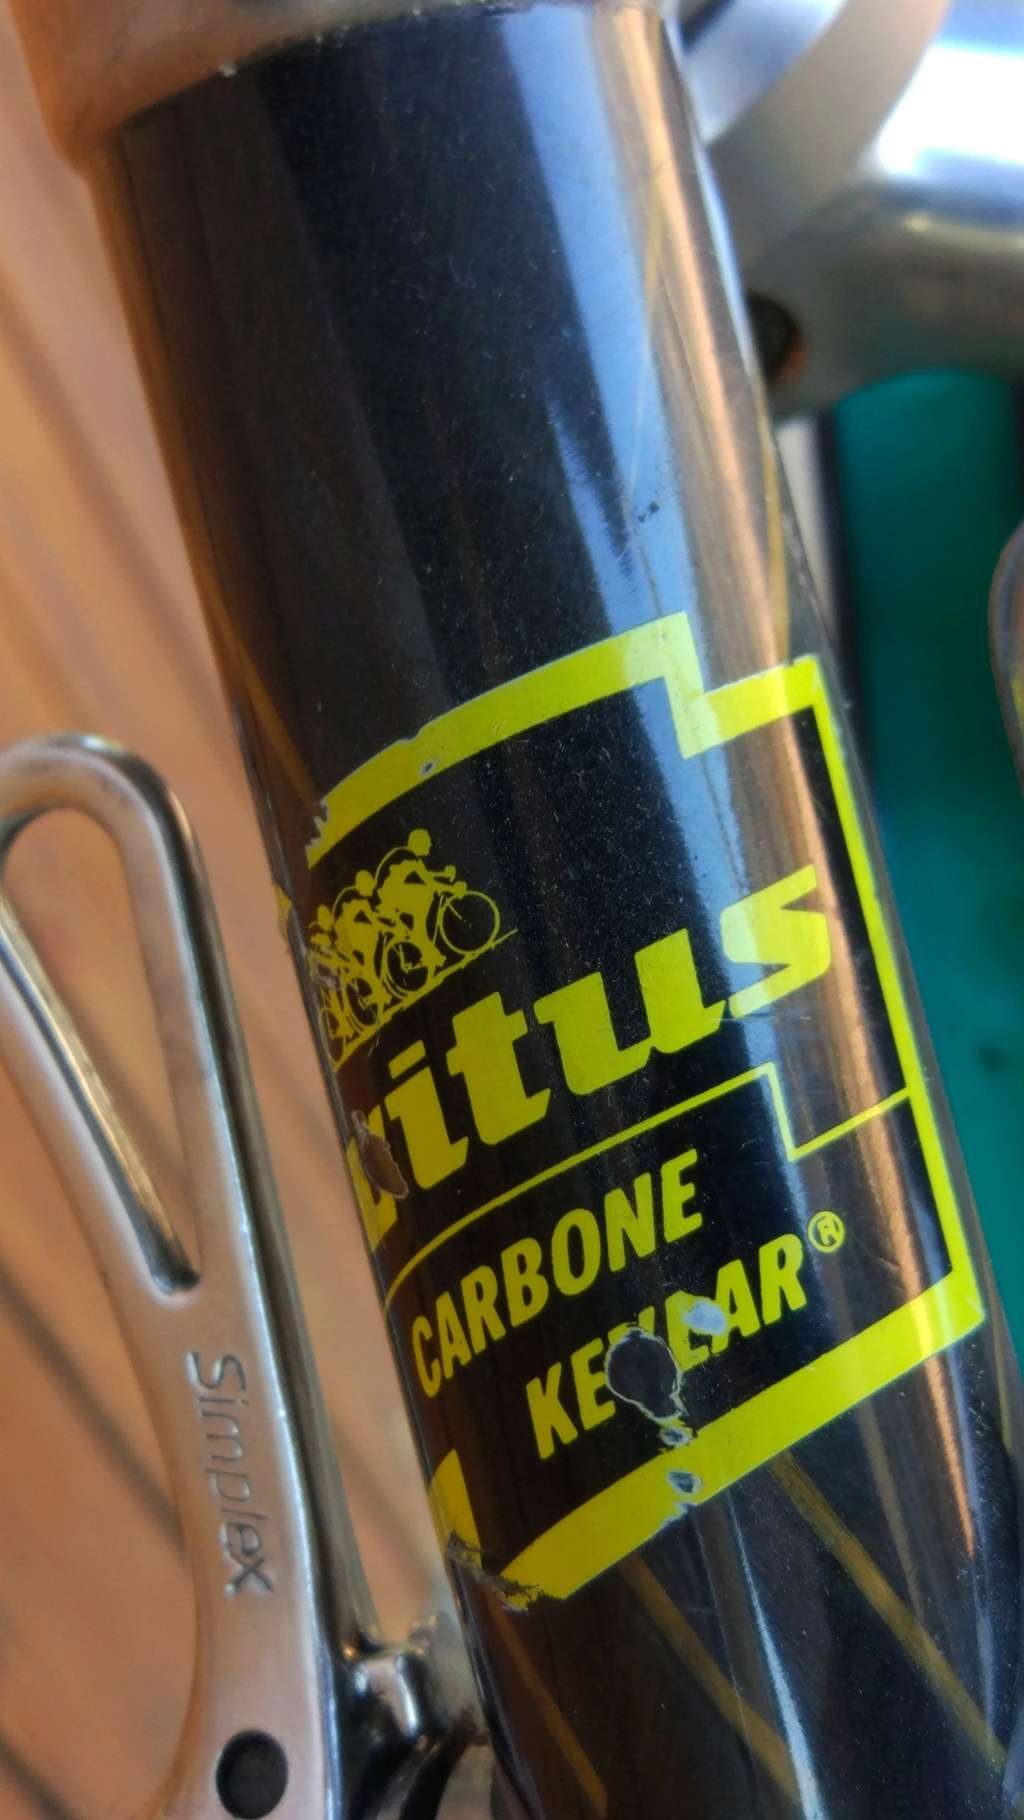 Vitus 979 Carbone 9 Img_2059